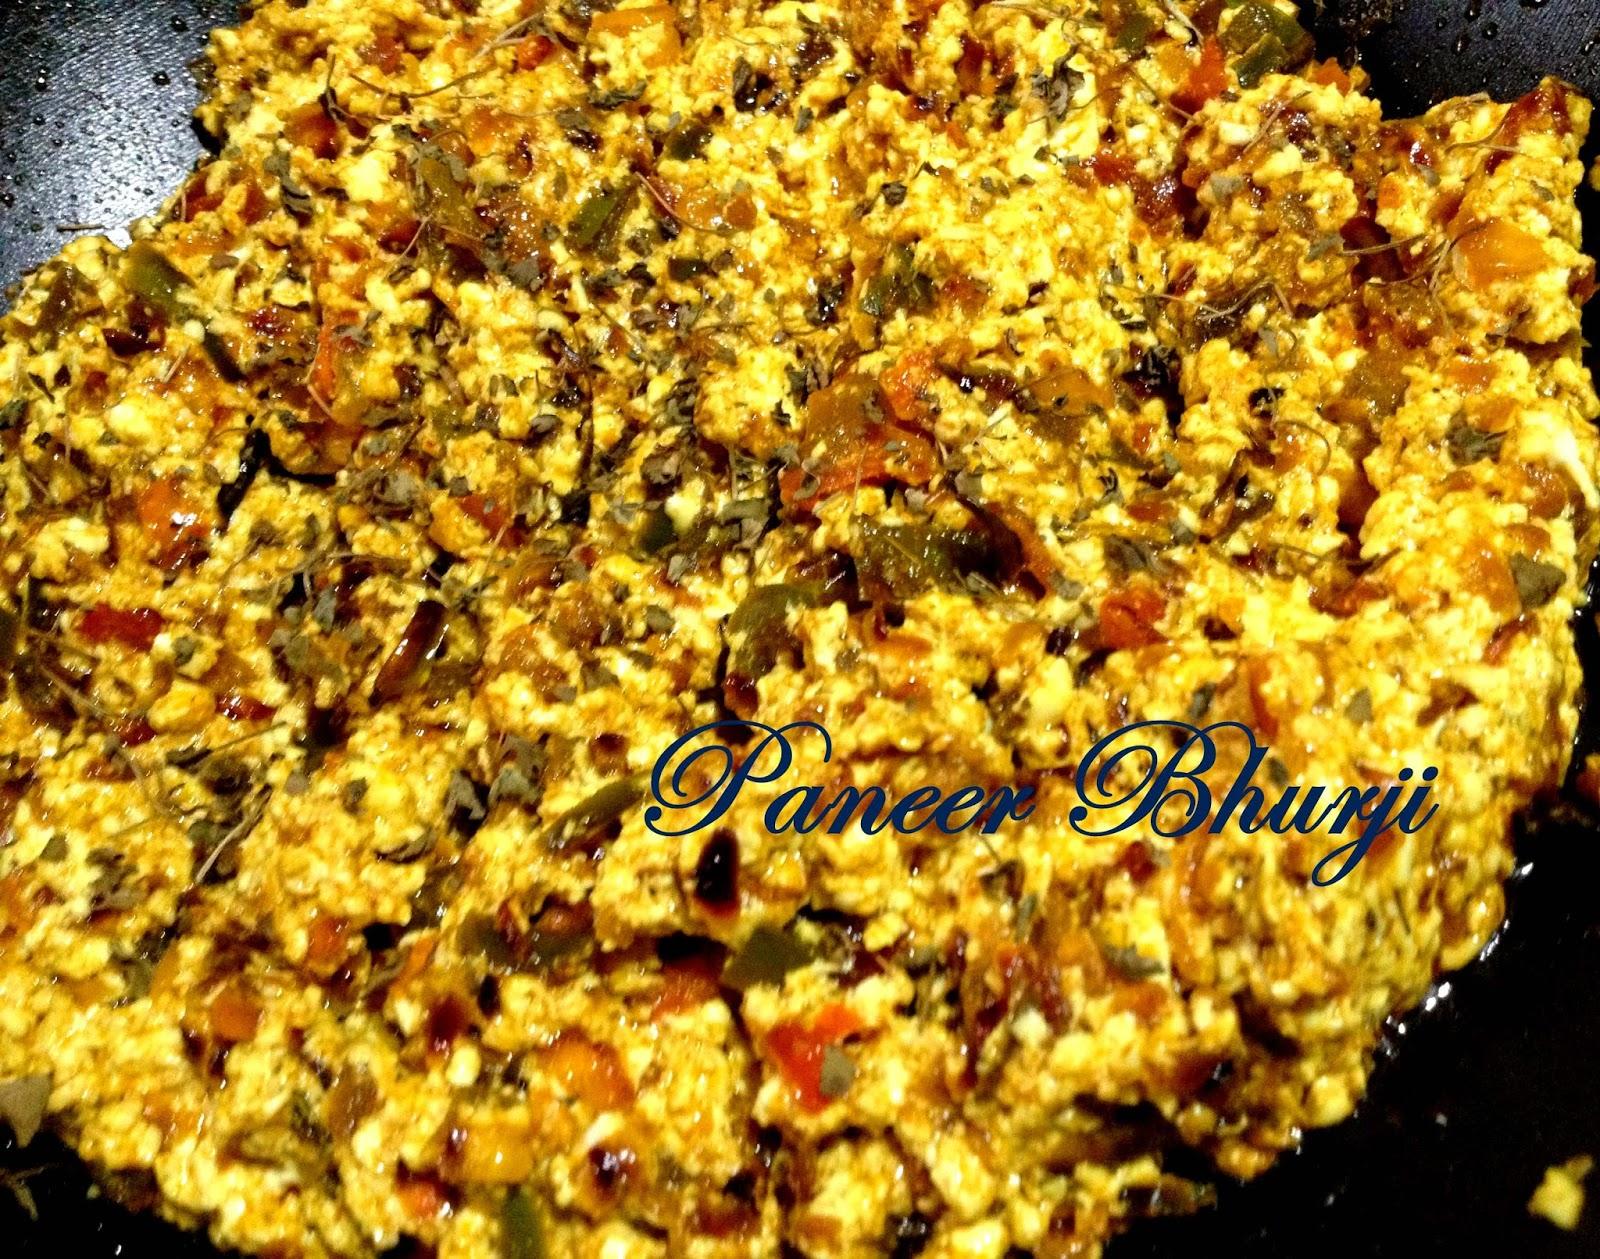 Easy cooking with ekta paneer bhurji recipe in hindi scrambled paneer bhurji recipe in hindi scrambled cottage cheese restaurant style by ekta forumfinder Images